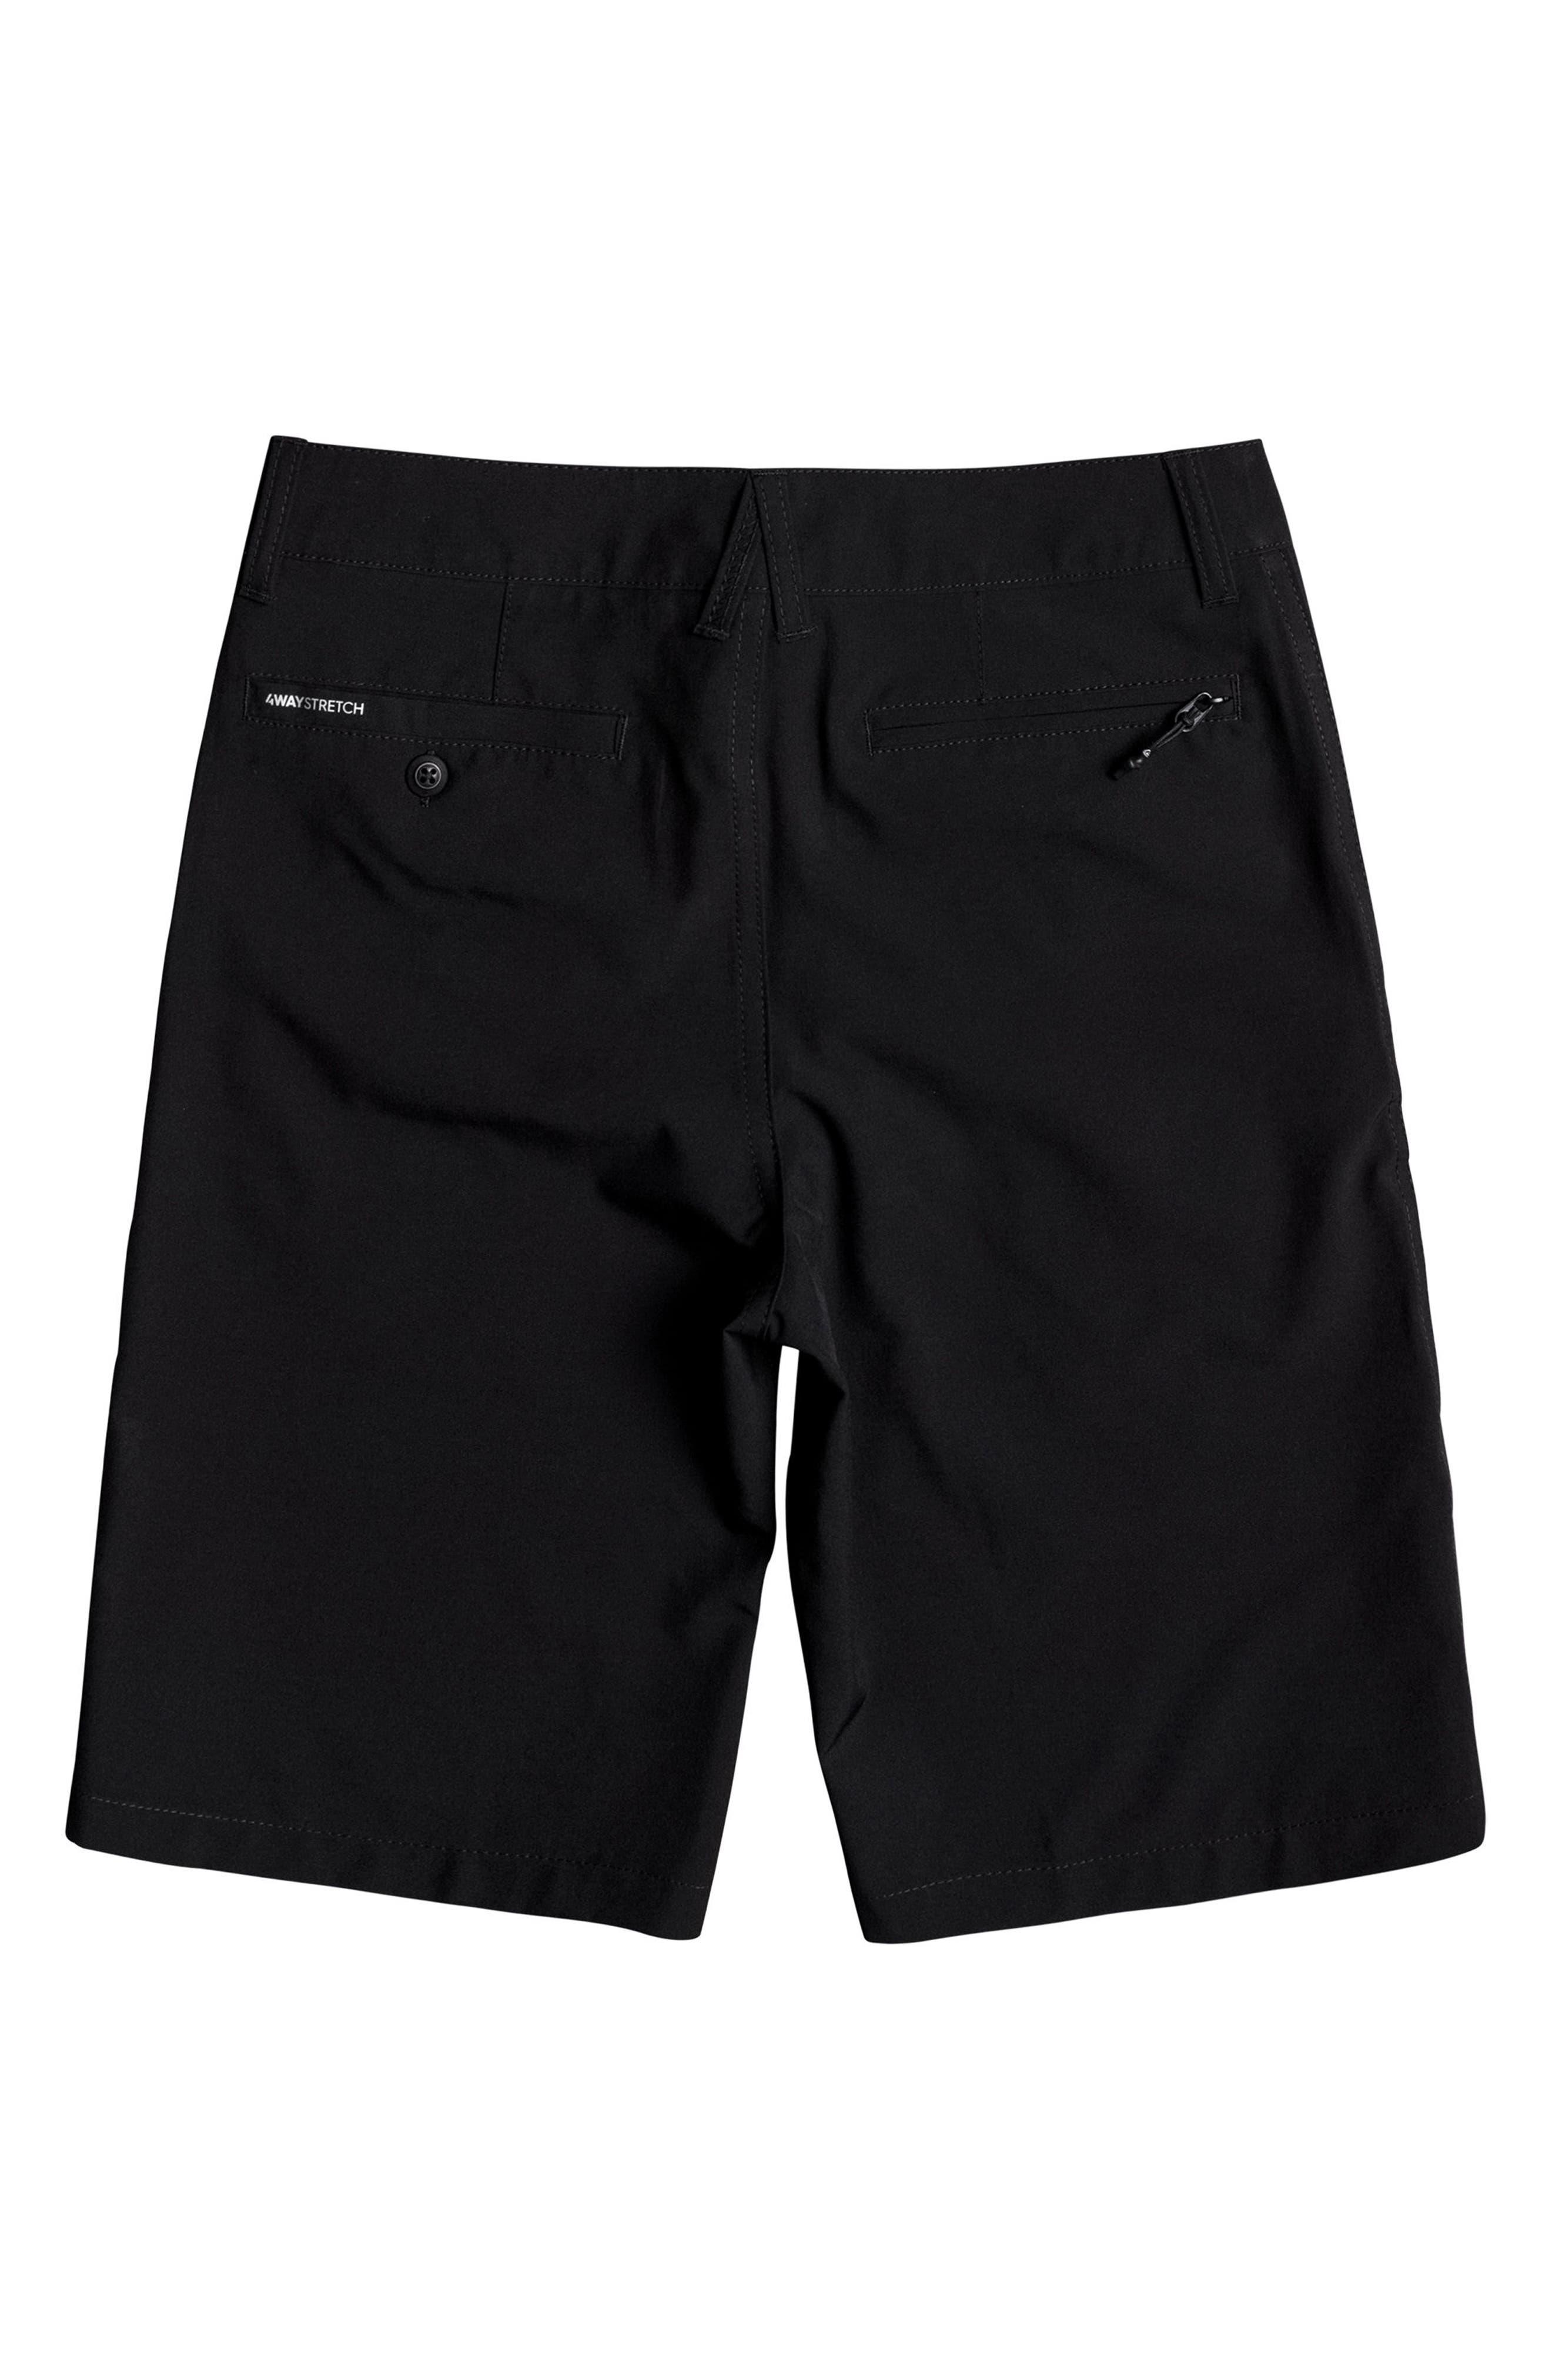 Union Amphibian Board Shorts,                             Alternate thumbnail 5, color,